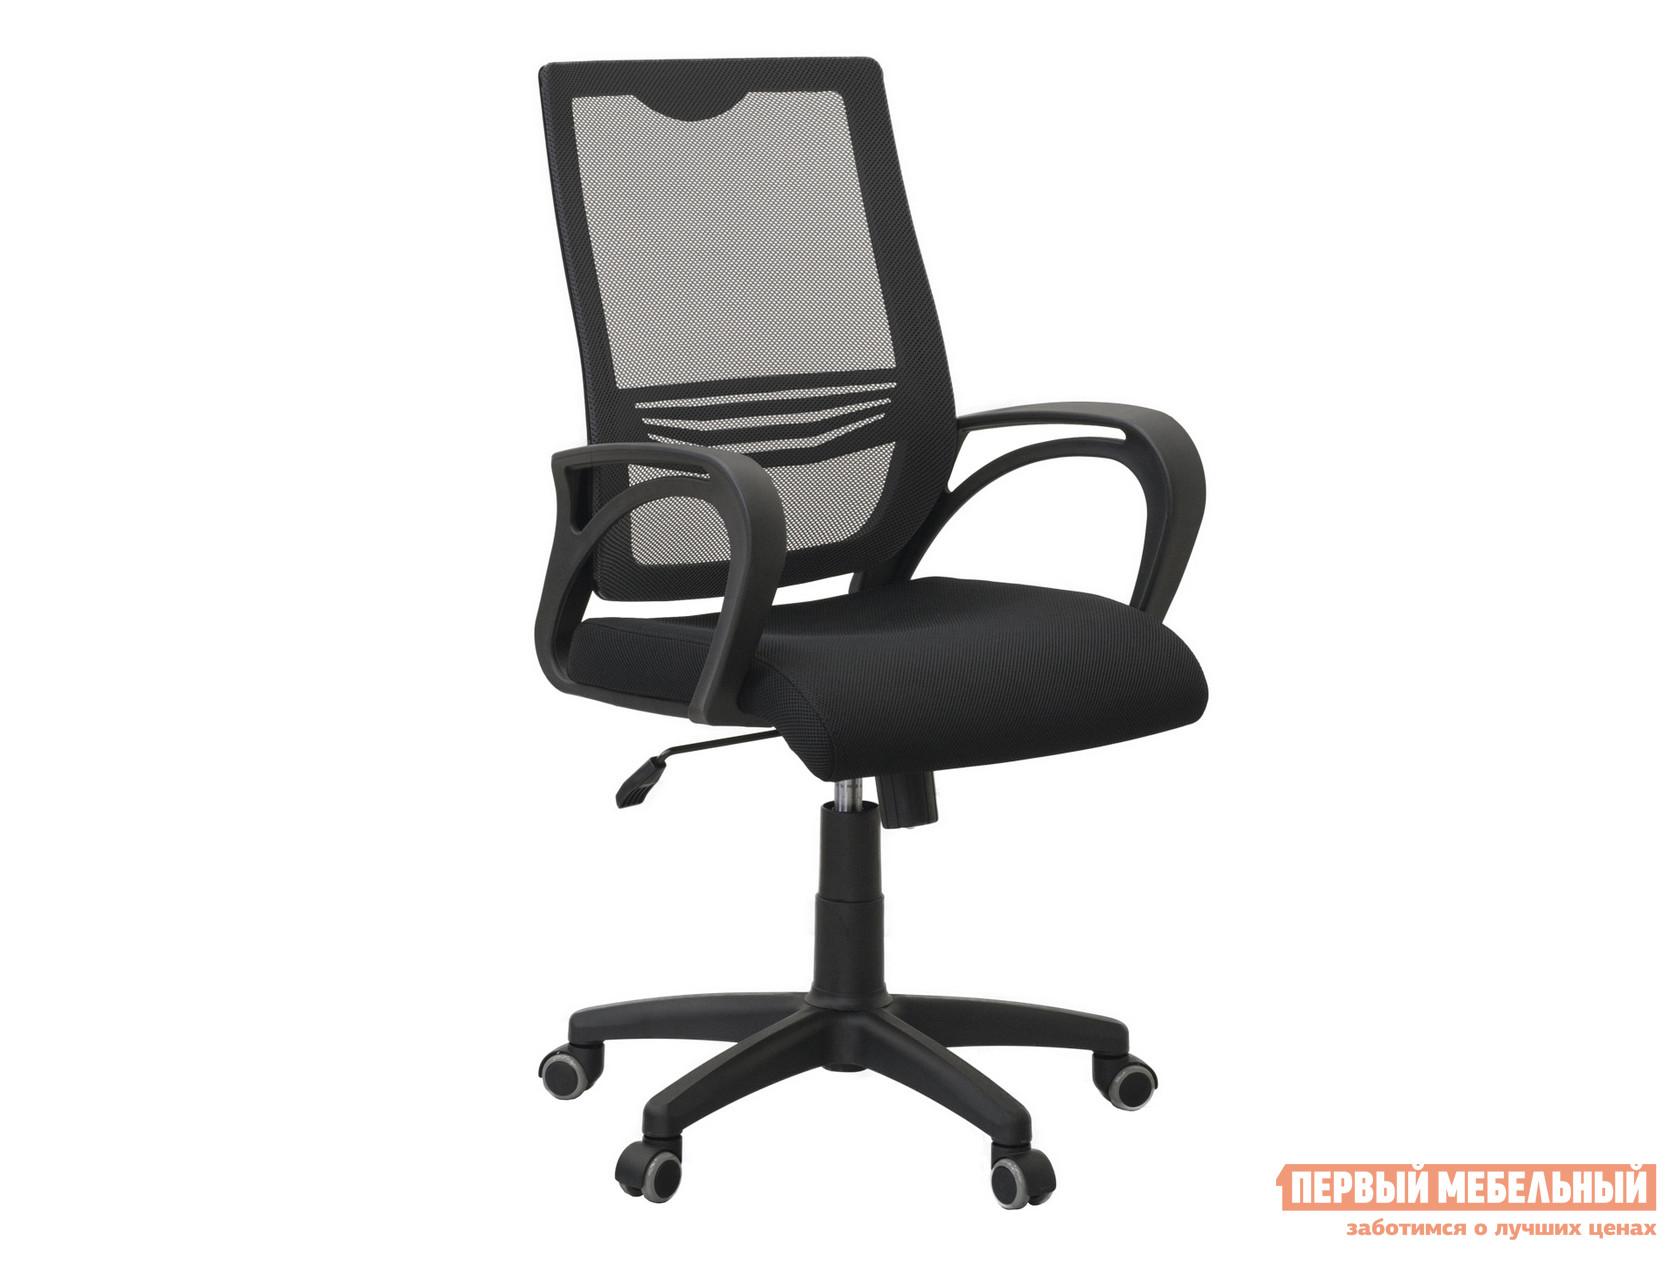 Офисное кресло Pointex Shape A кресло a prosperous furniture